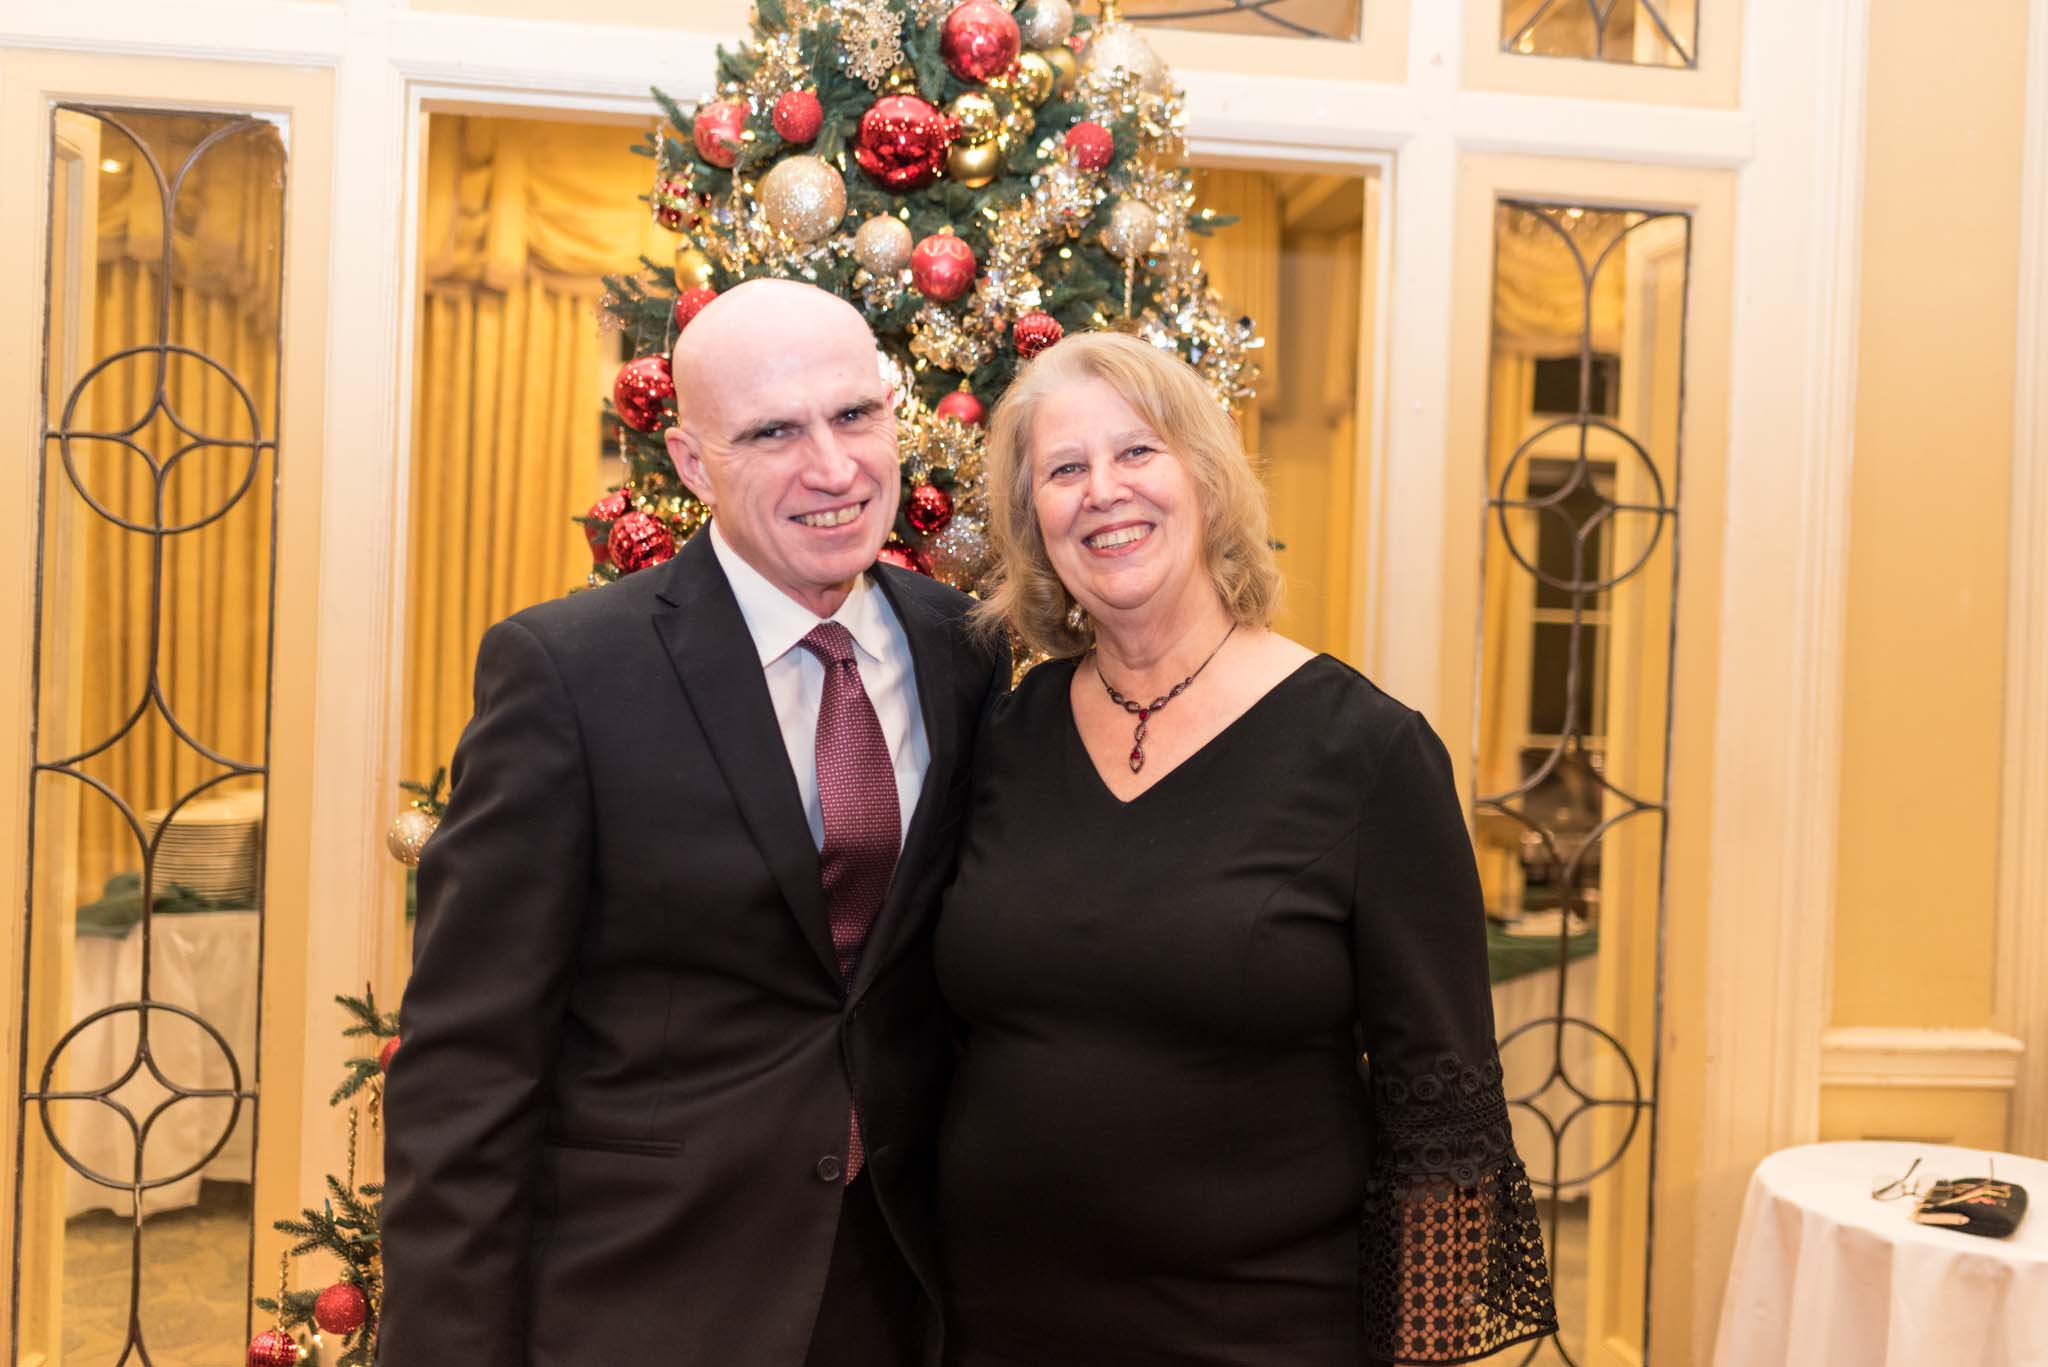 John and Susan Stanley